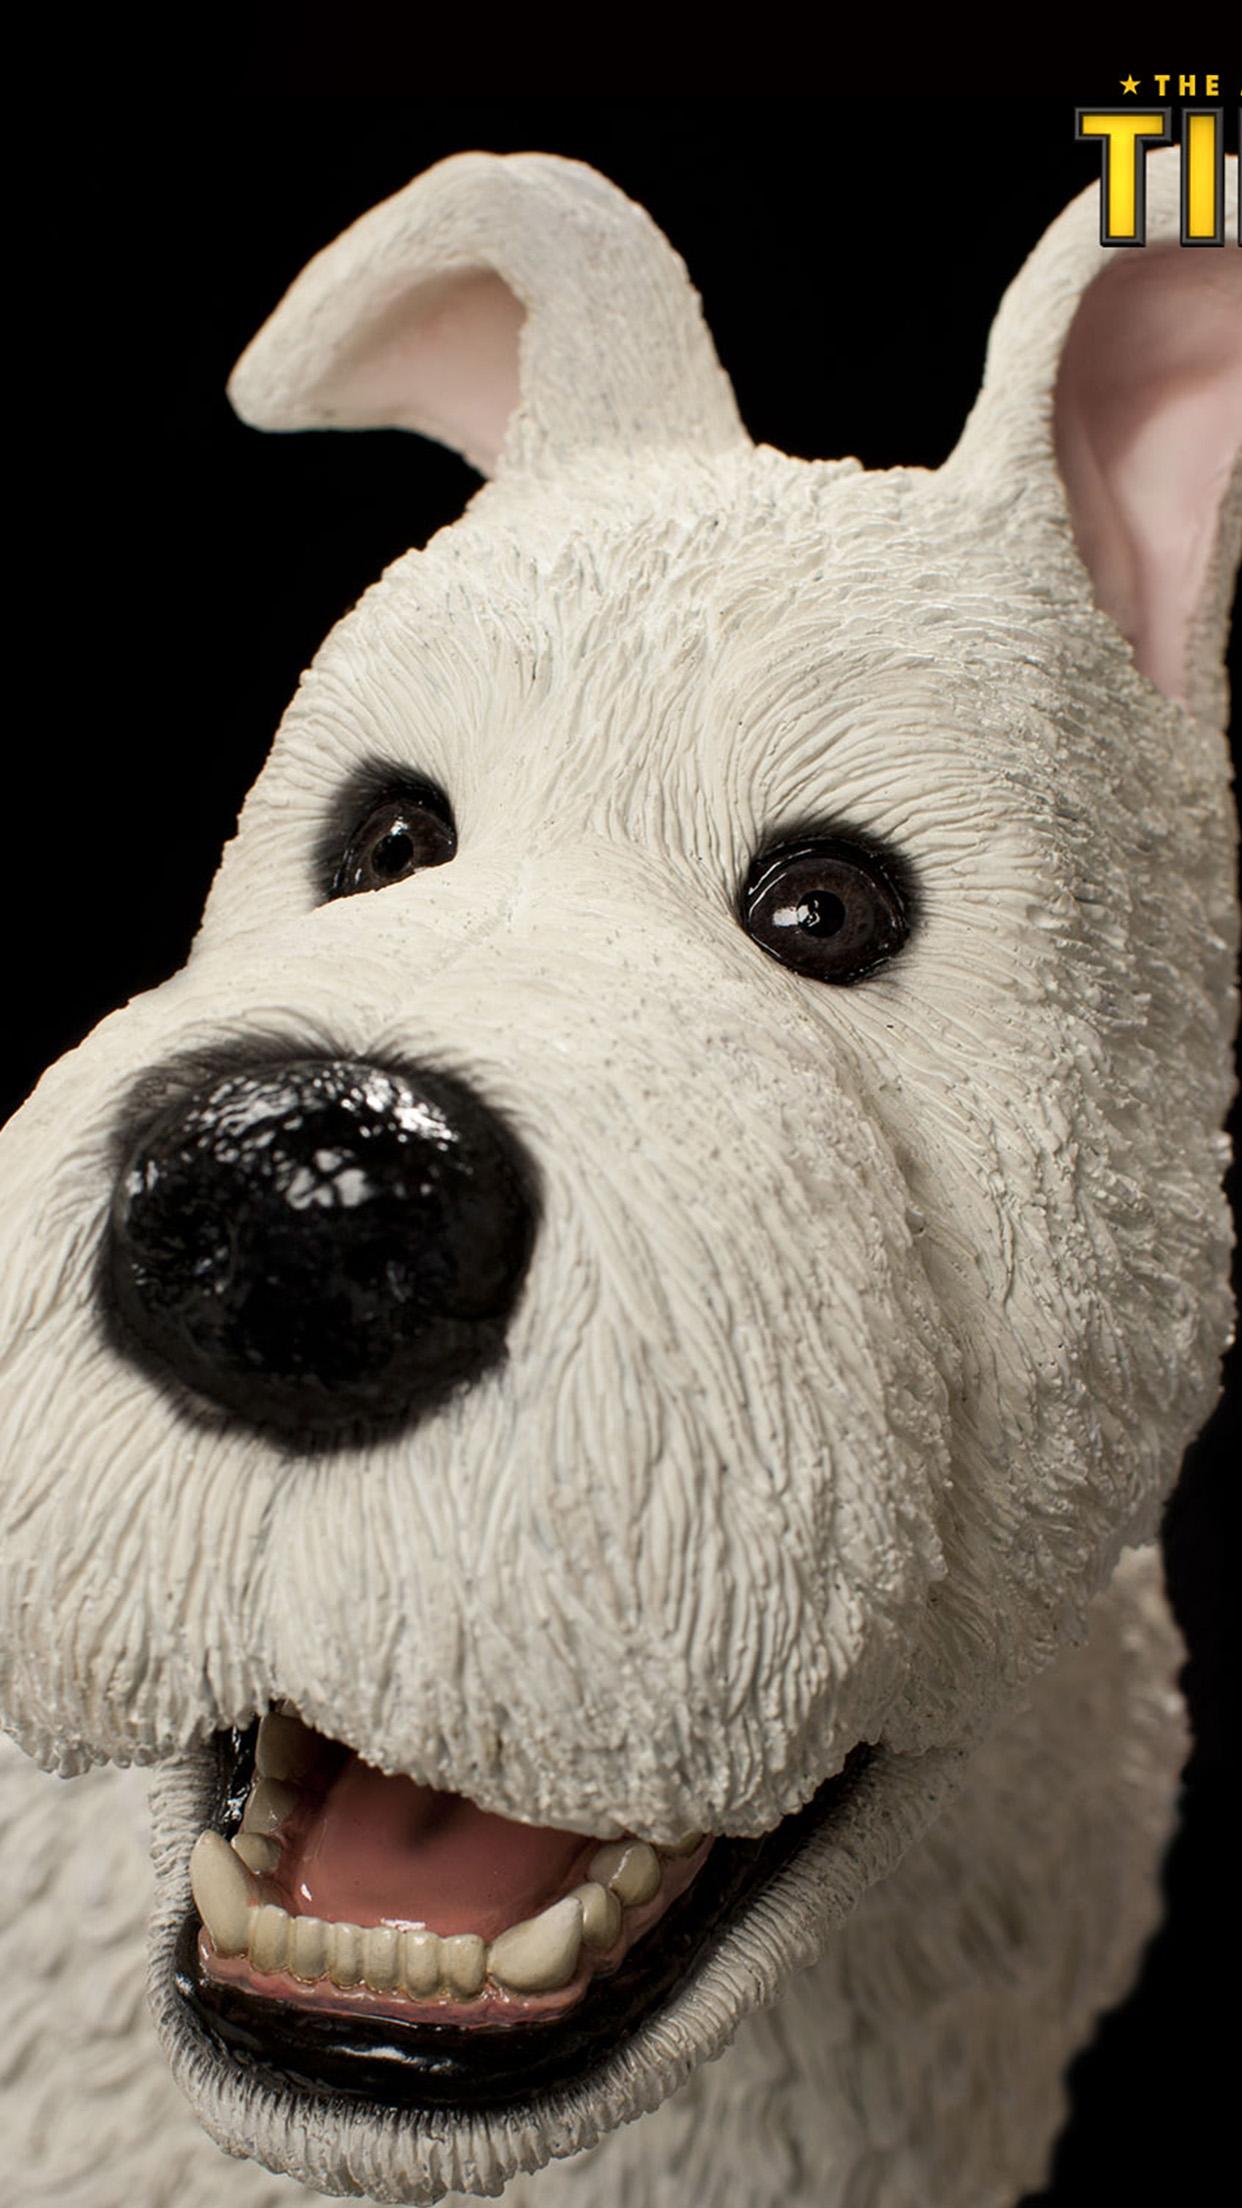 ap71-the-adventures-of-tintin-dog-cute-wallpaper